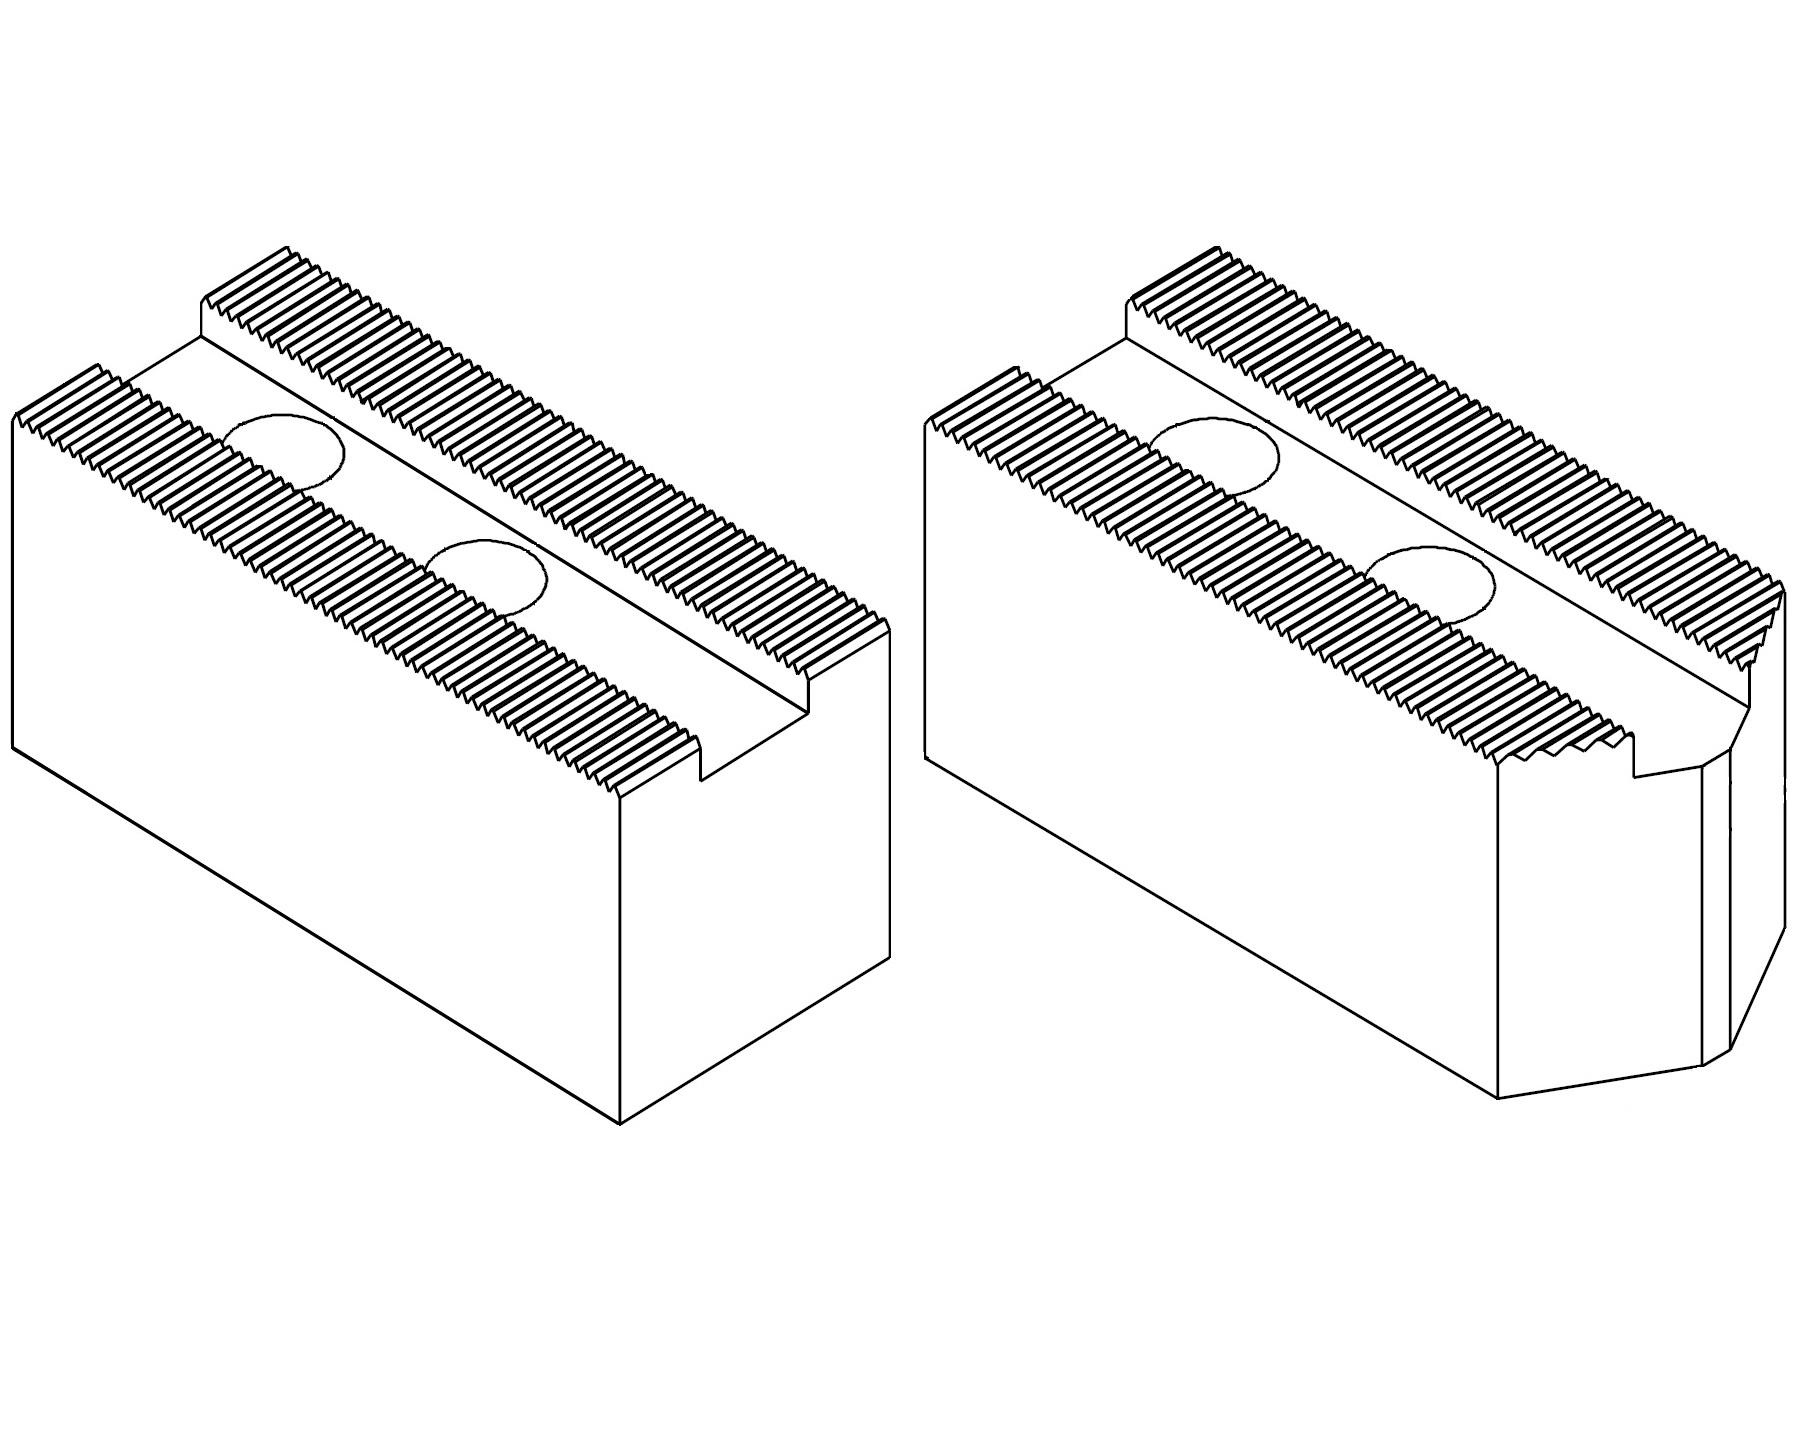 Čelisti měkké 1,5x60°, šířka drážky - 16  (sklíčidla pr. 254mm)